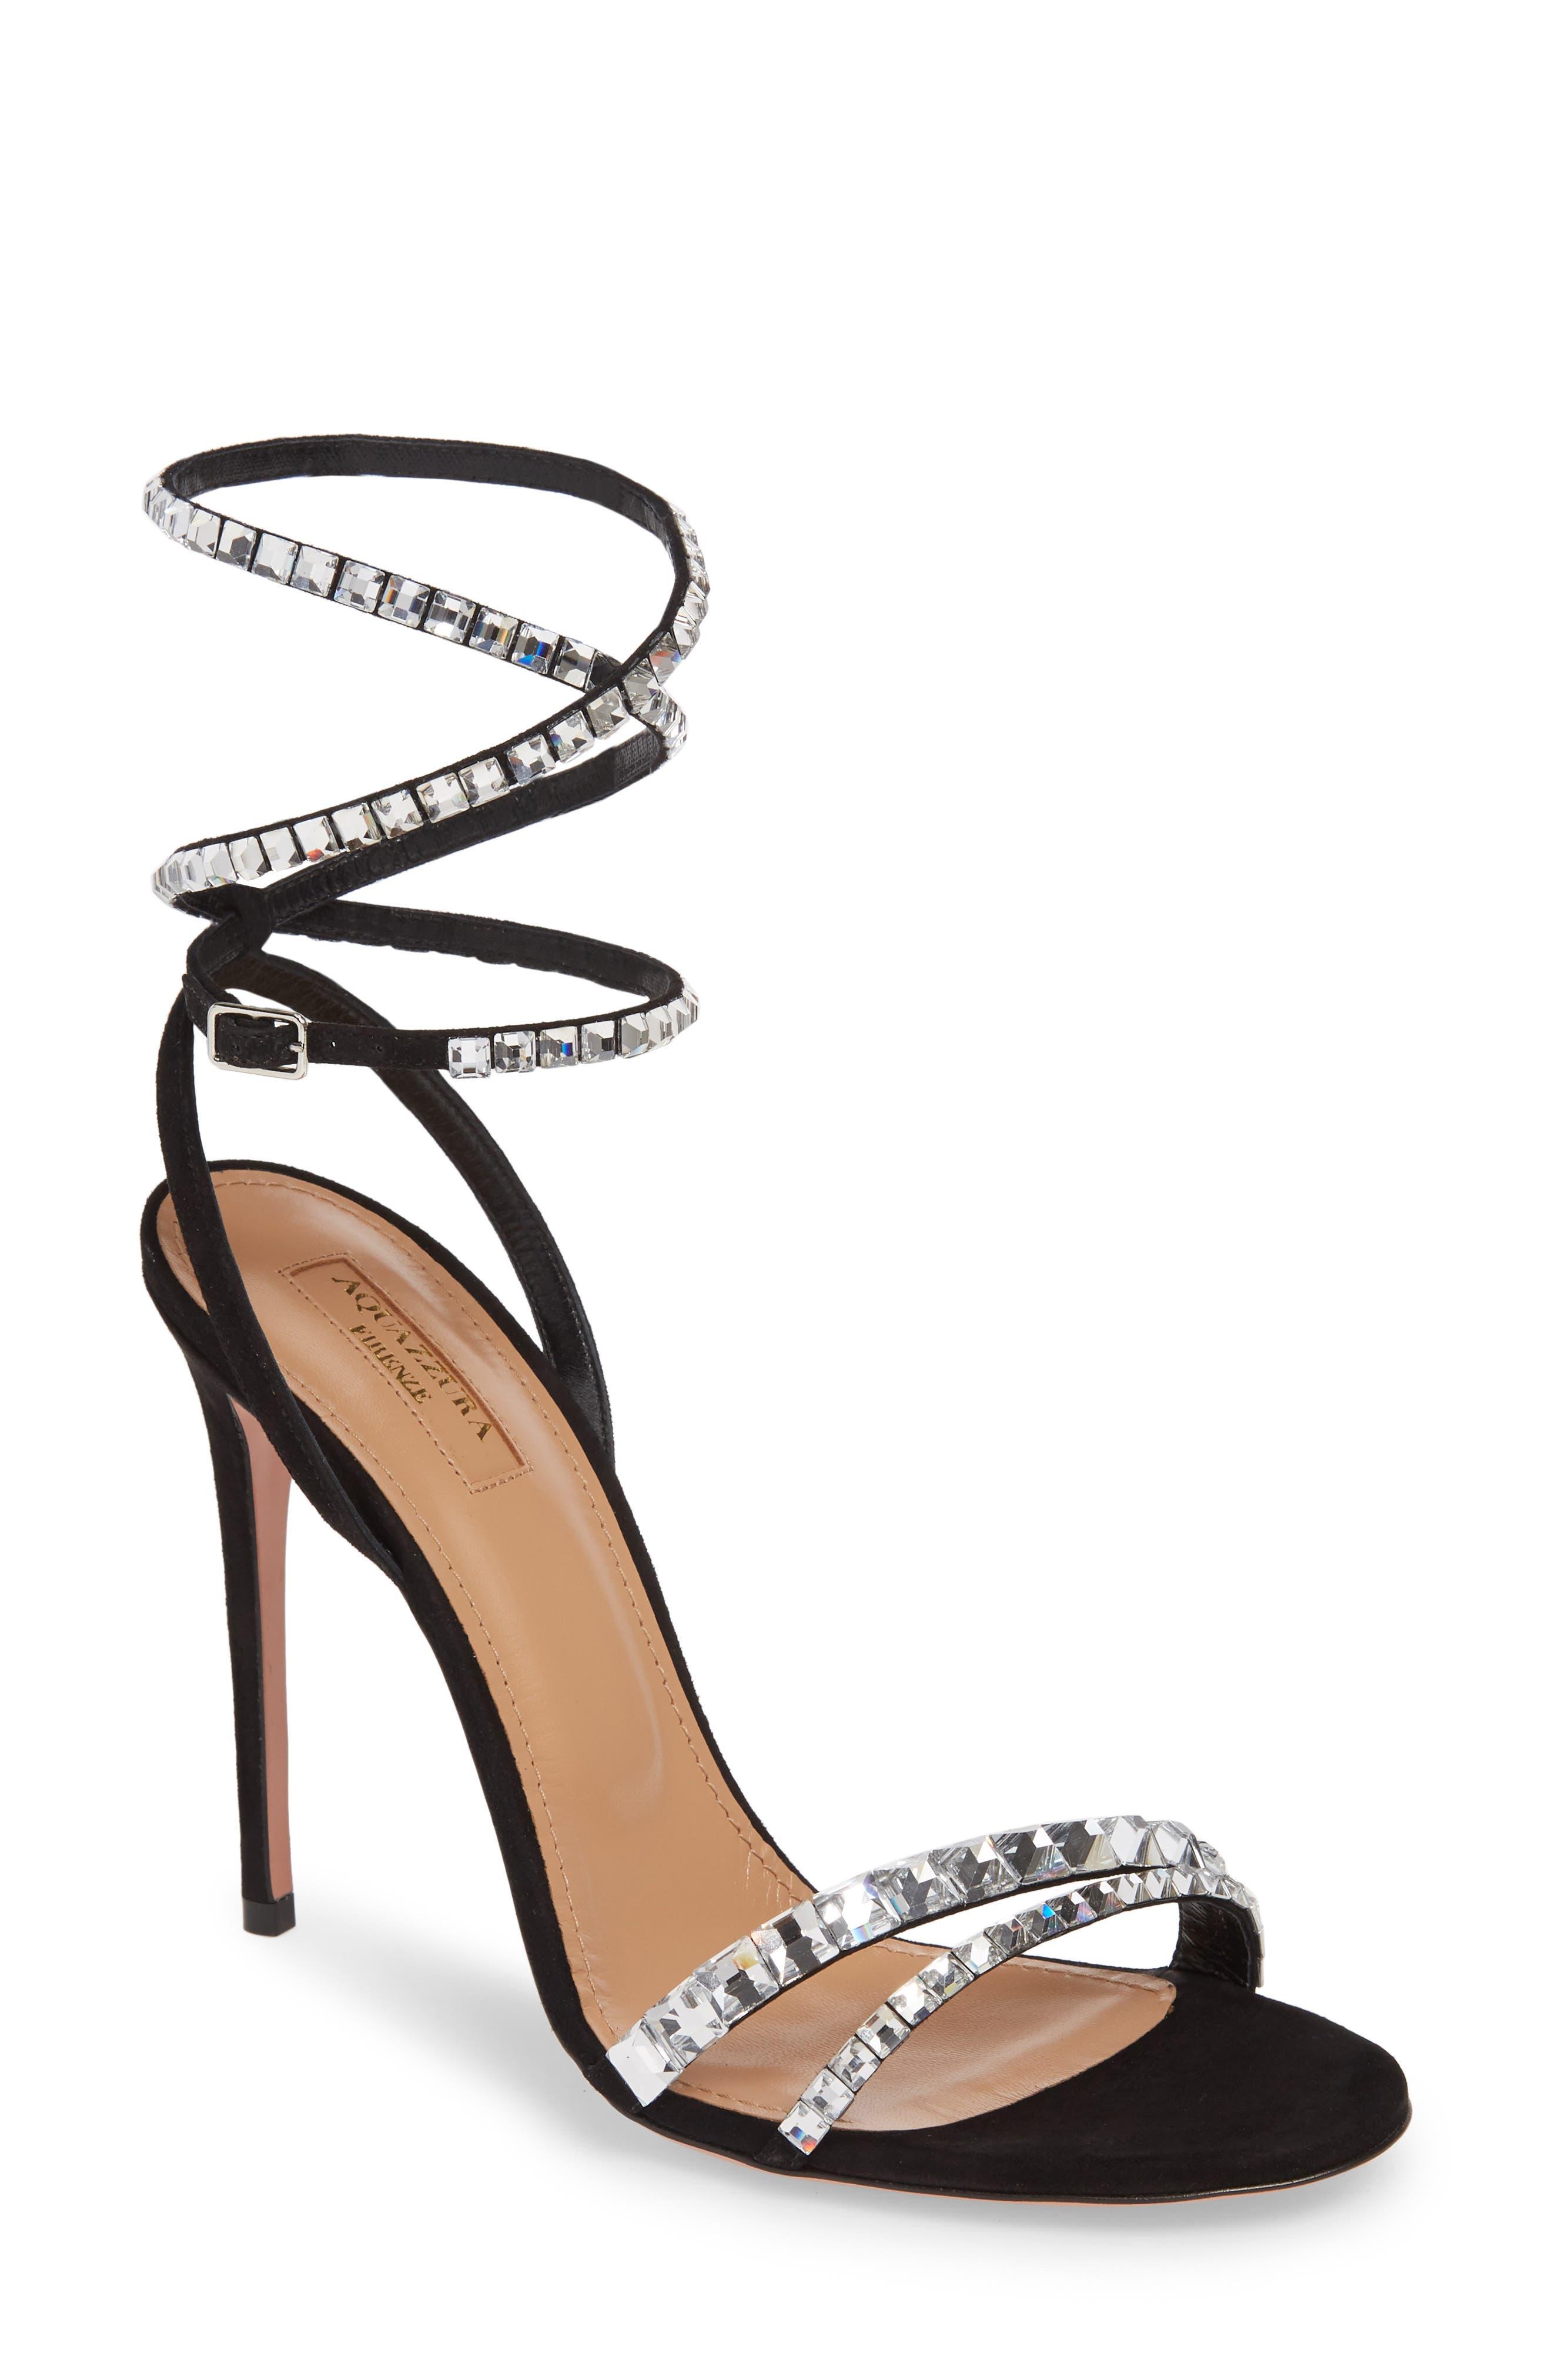 Aquazzura Slippers So Vera Ankle Wrap Sandal